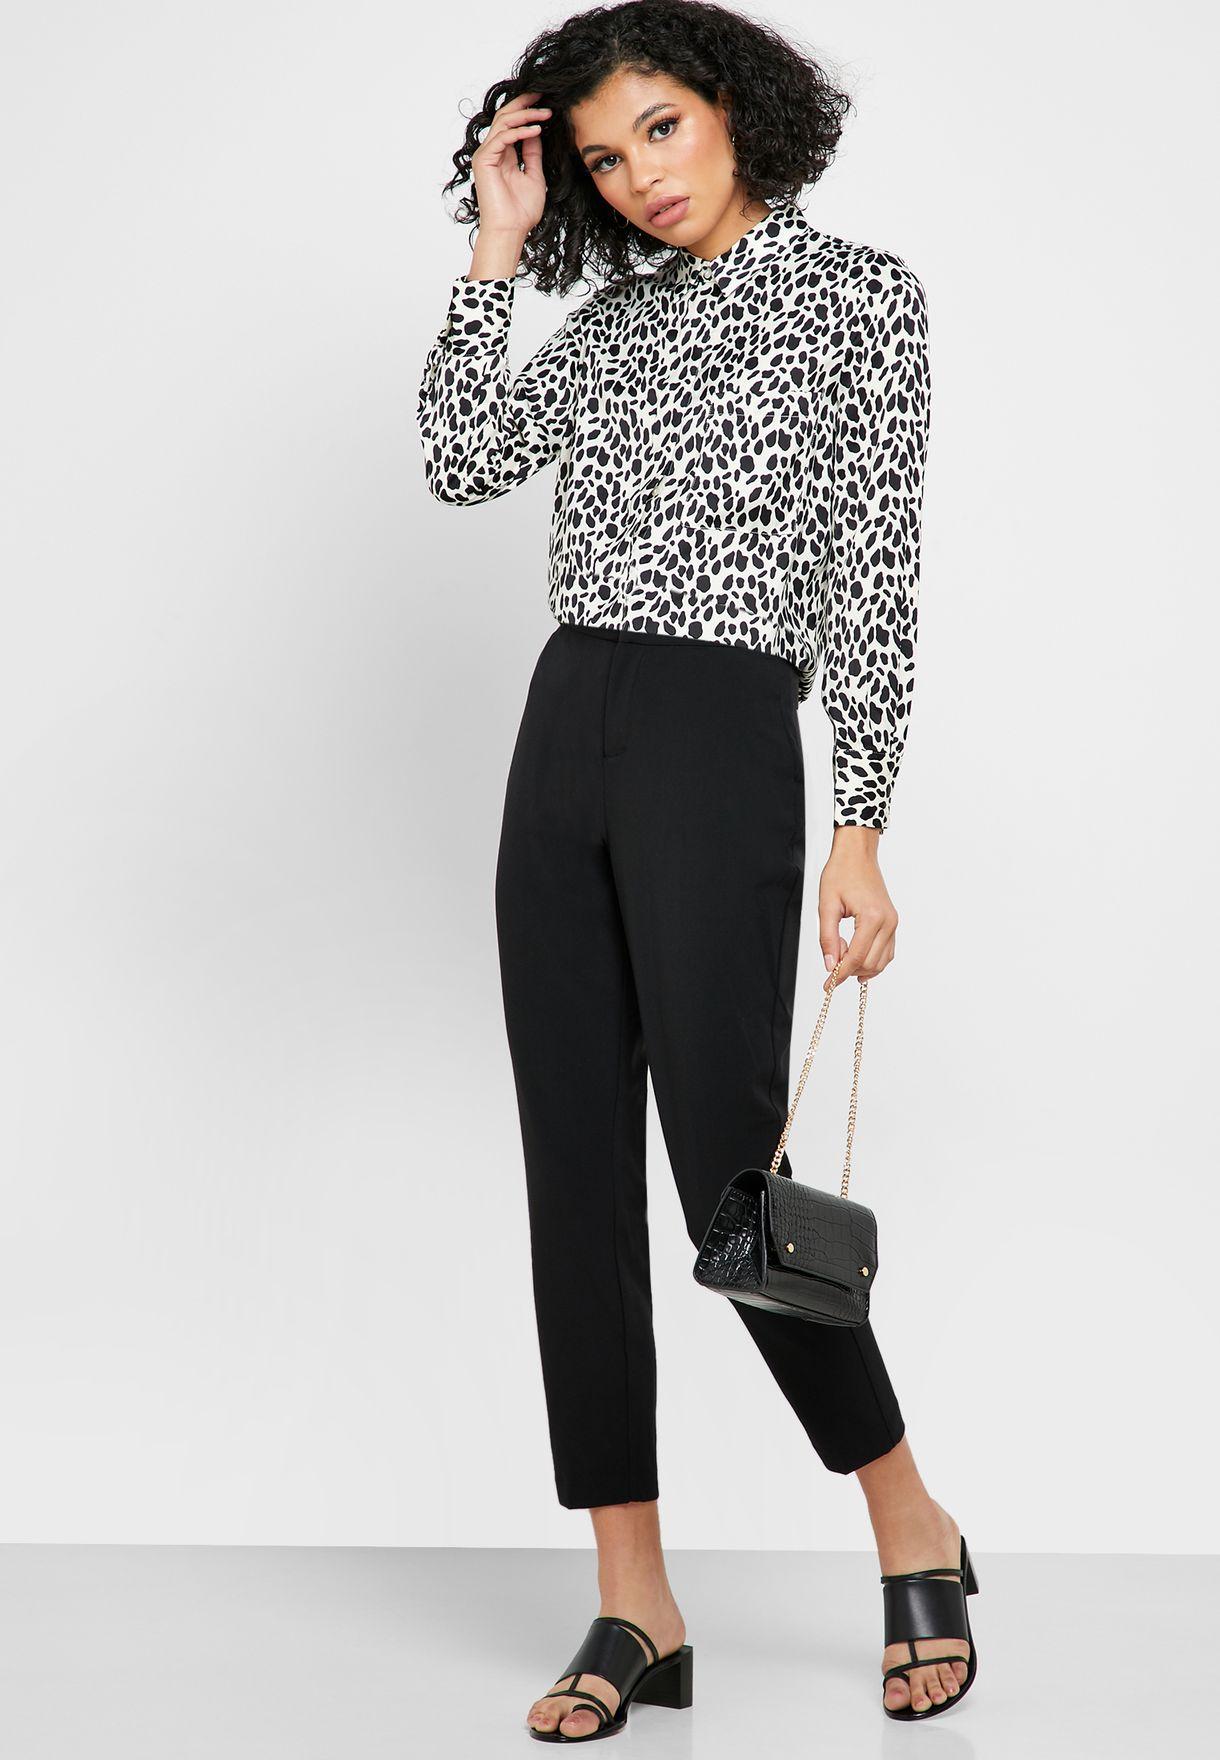 Leopard Print Waist Band Pants